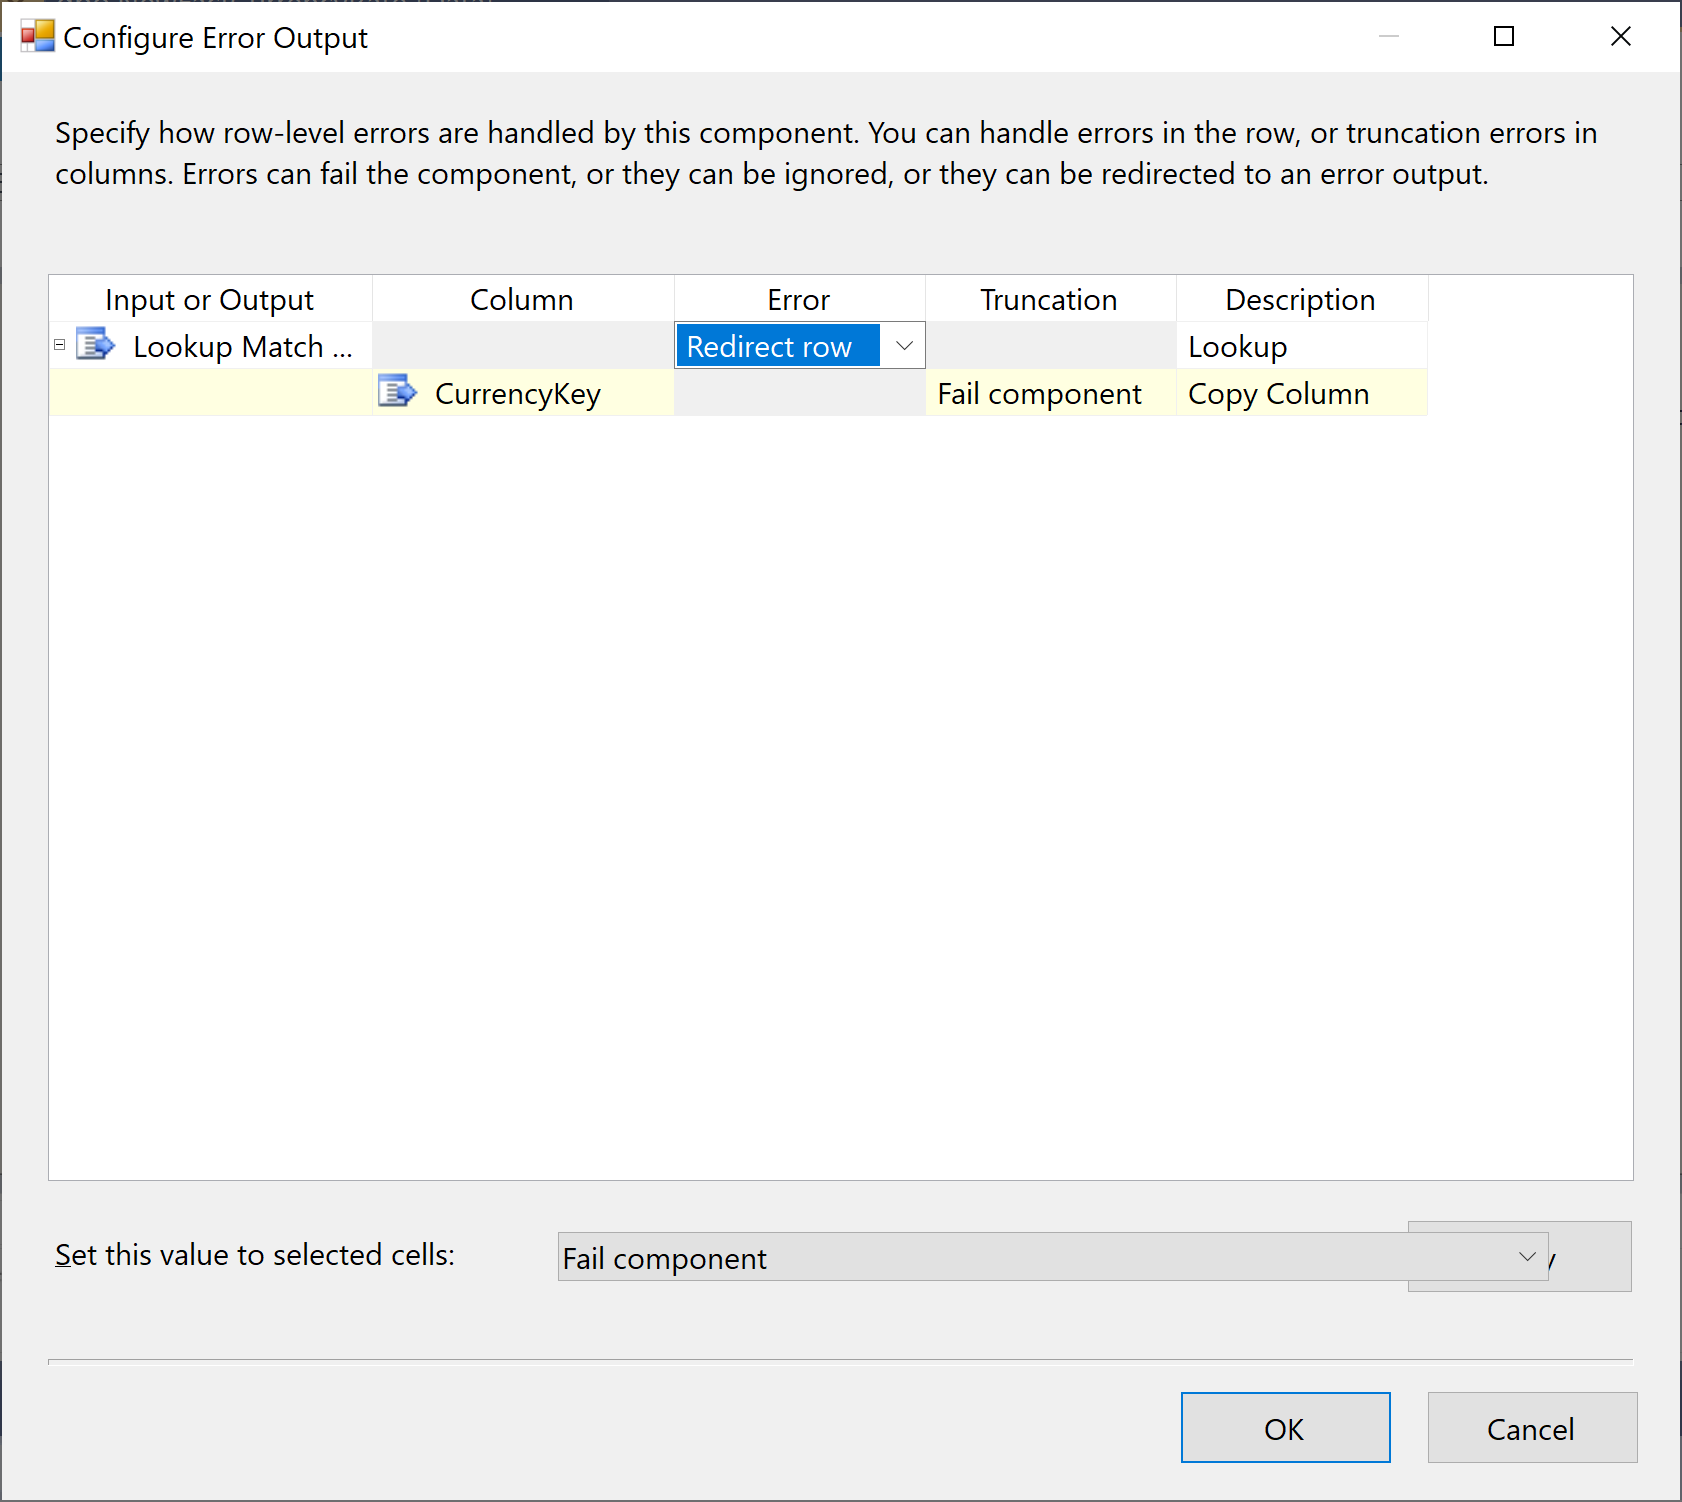 Configure Error Output dialog